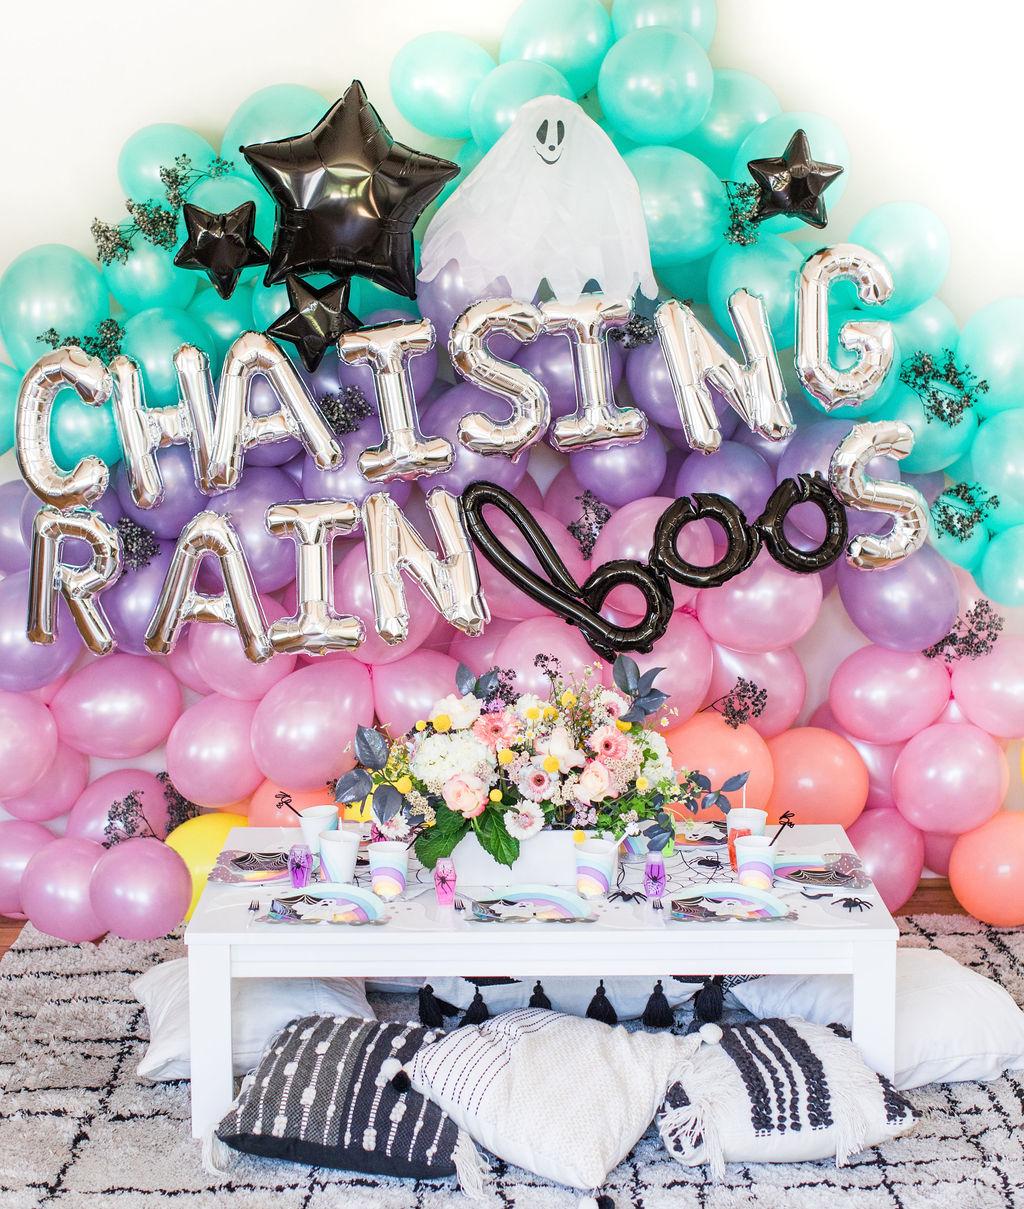 Chasing RainBOOs Kid's Halloween Party